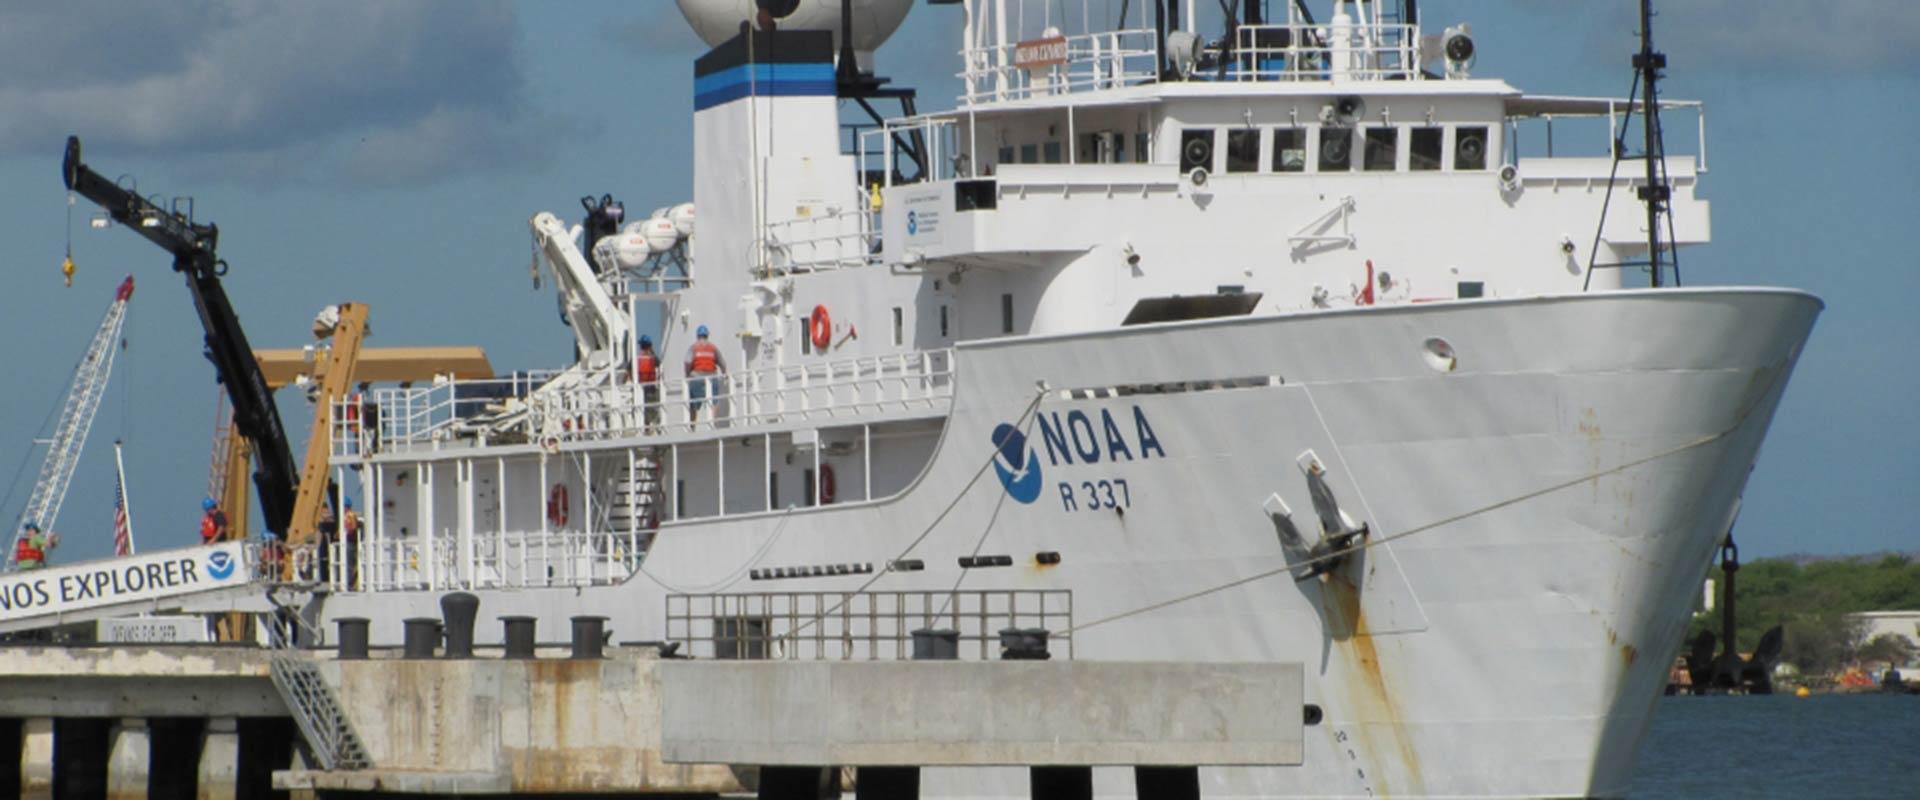 NOAA_SHIP#1